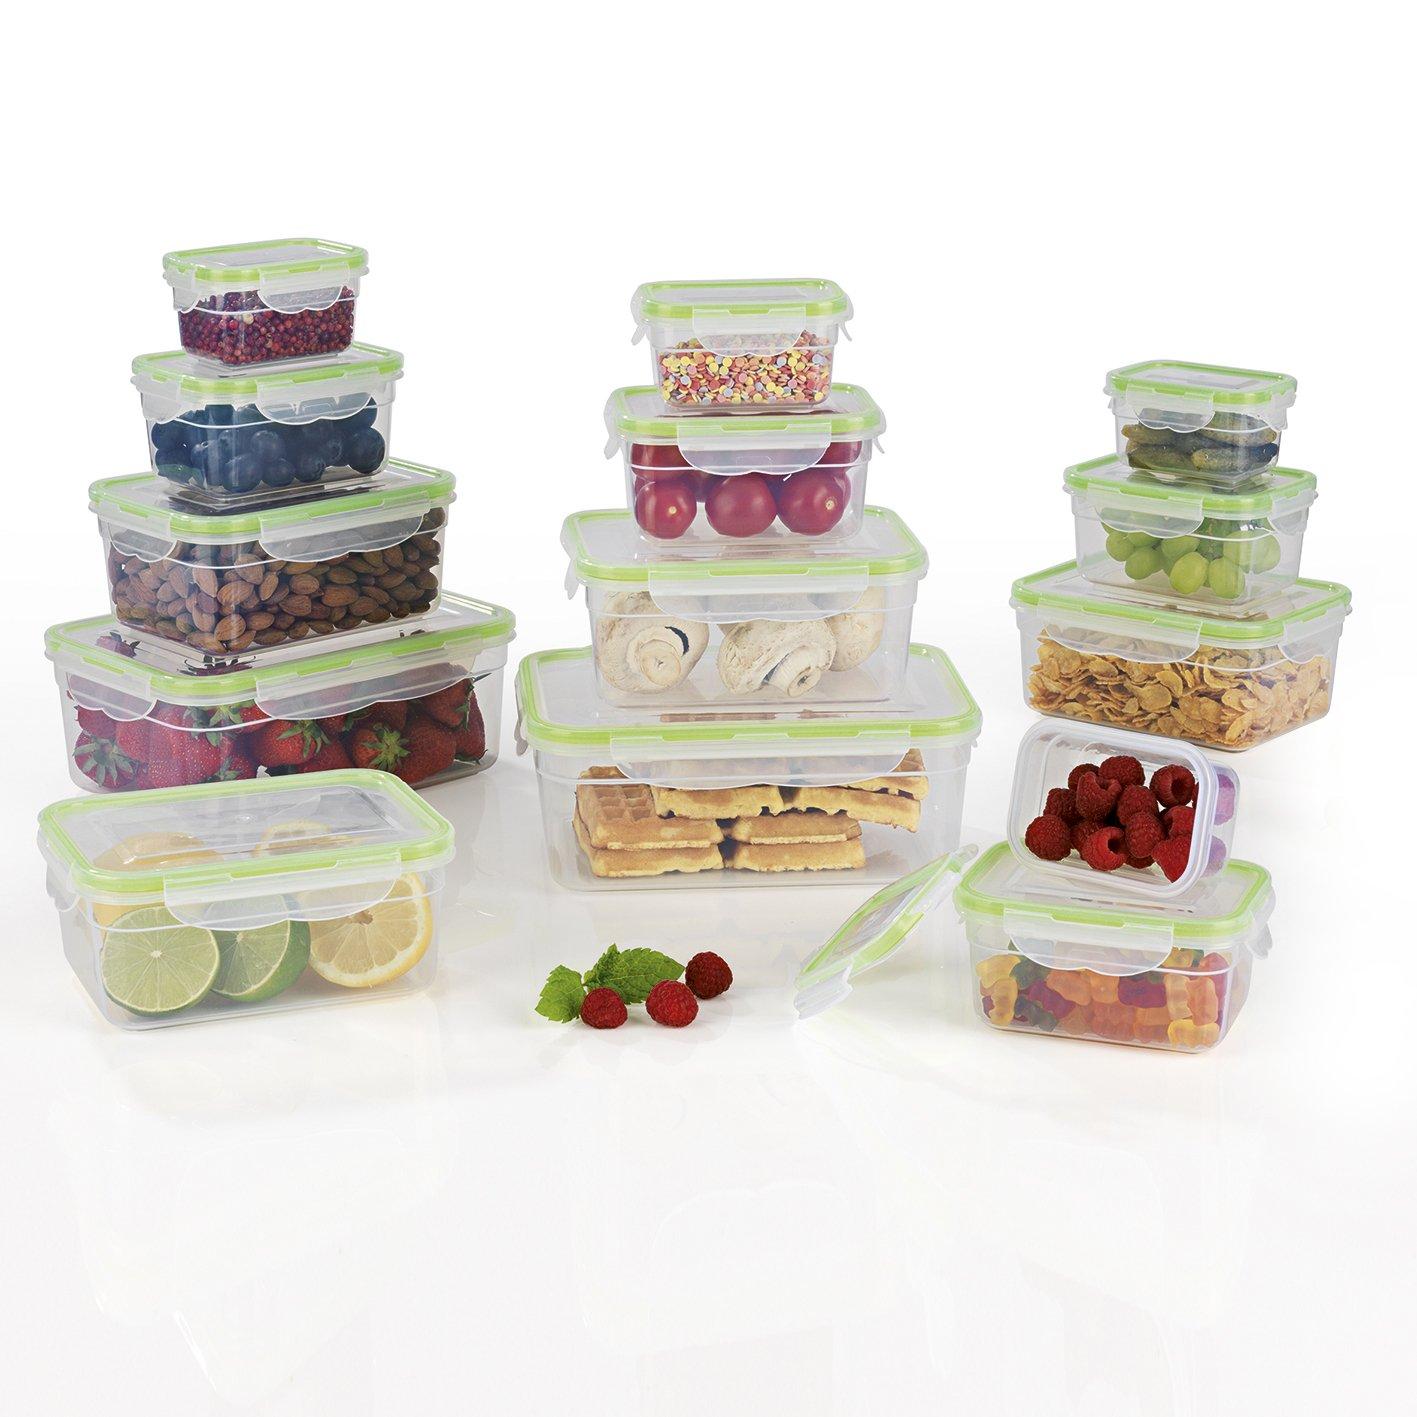 Gourmet Maxx 02824 Storage Boxes Click Storage Boxes | BPA Free | 28 Piece Microwave, Freezer and Dishwasher safe, BPA Free GOURMETmaxx